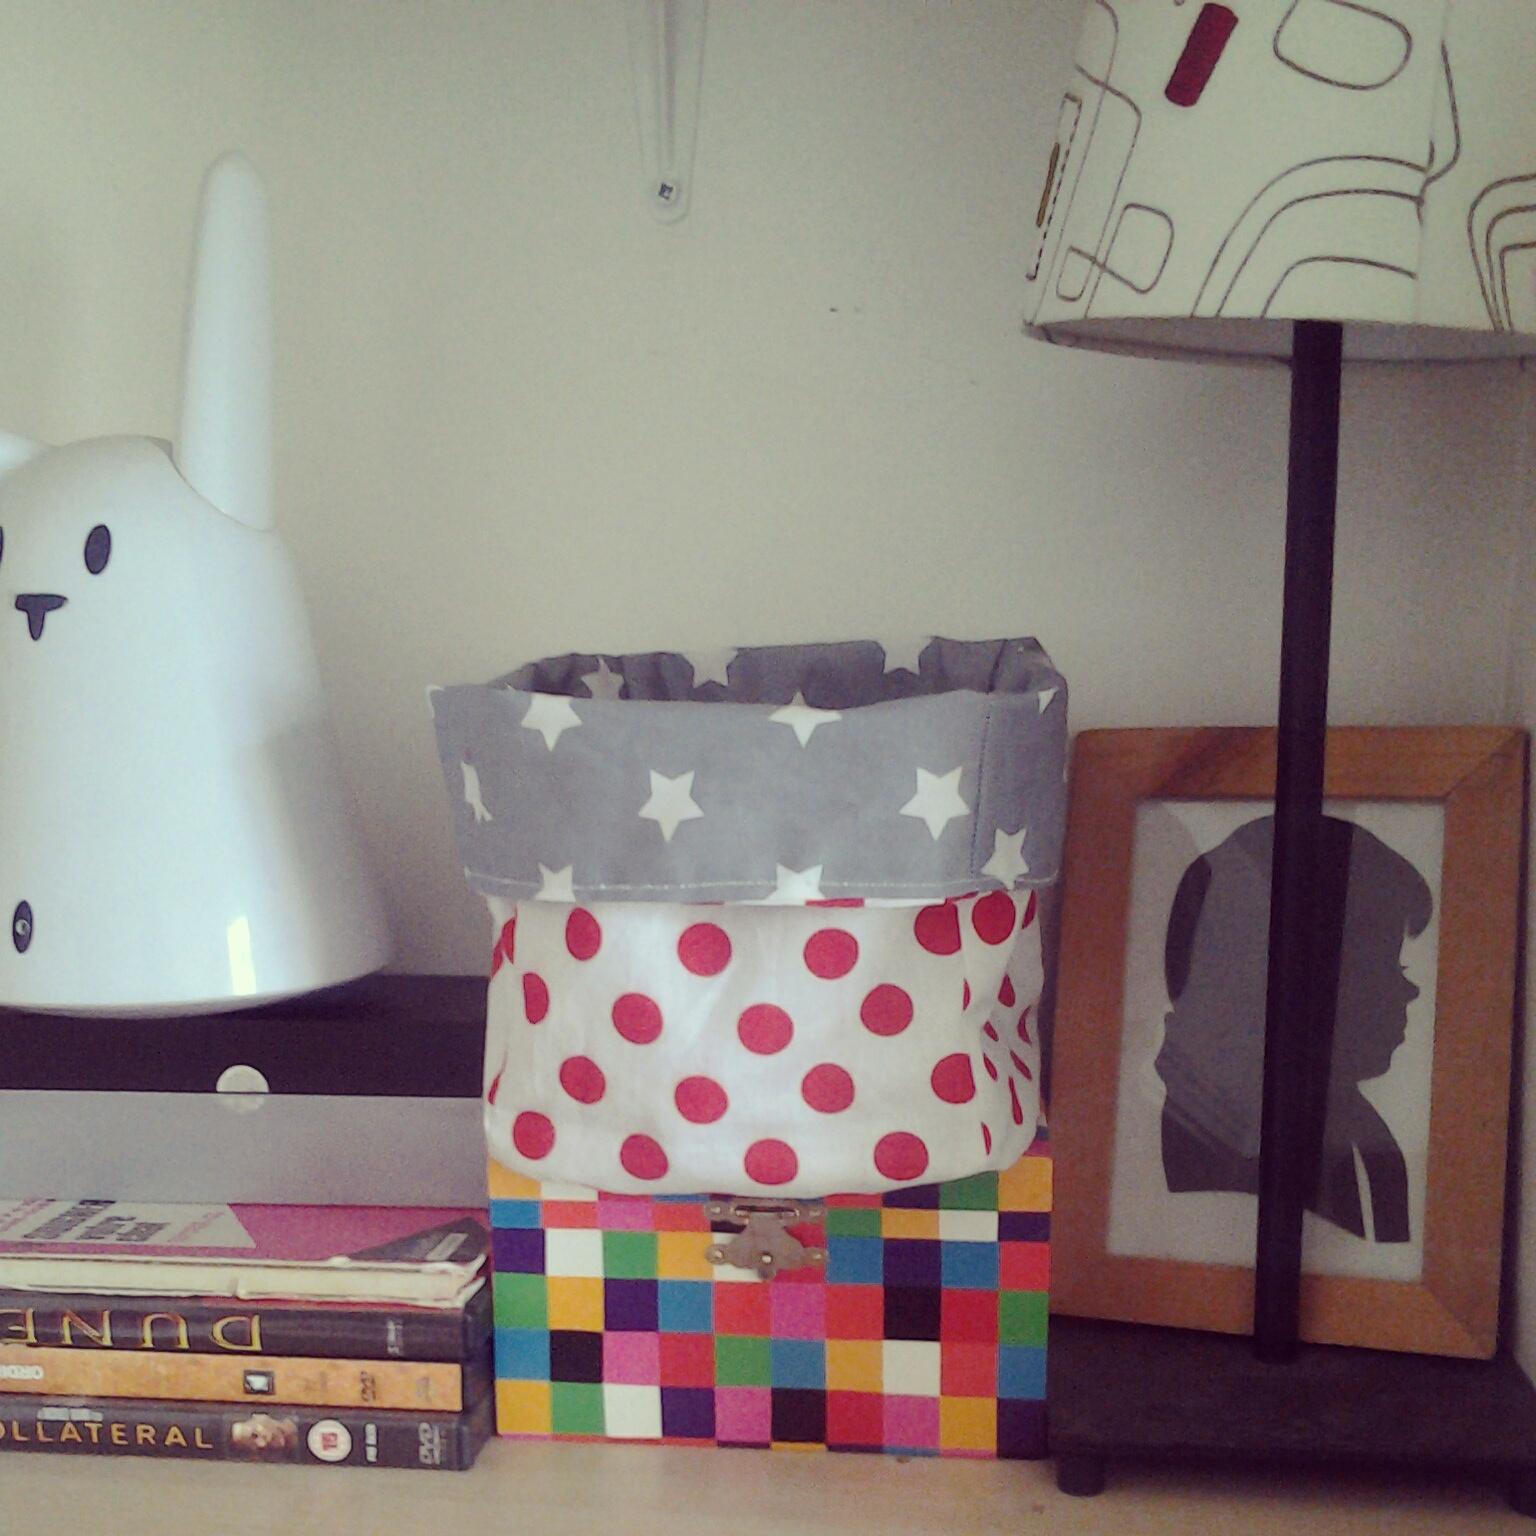 tutoriel couture vide poche facile mlle pois. Black Bedroom Furniture Sets. Home Design Ideas